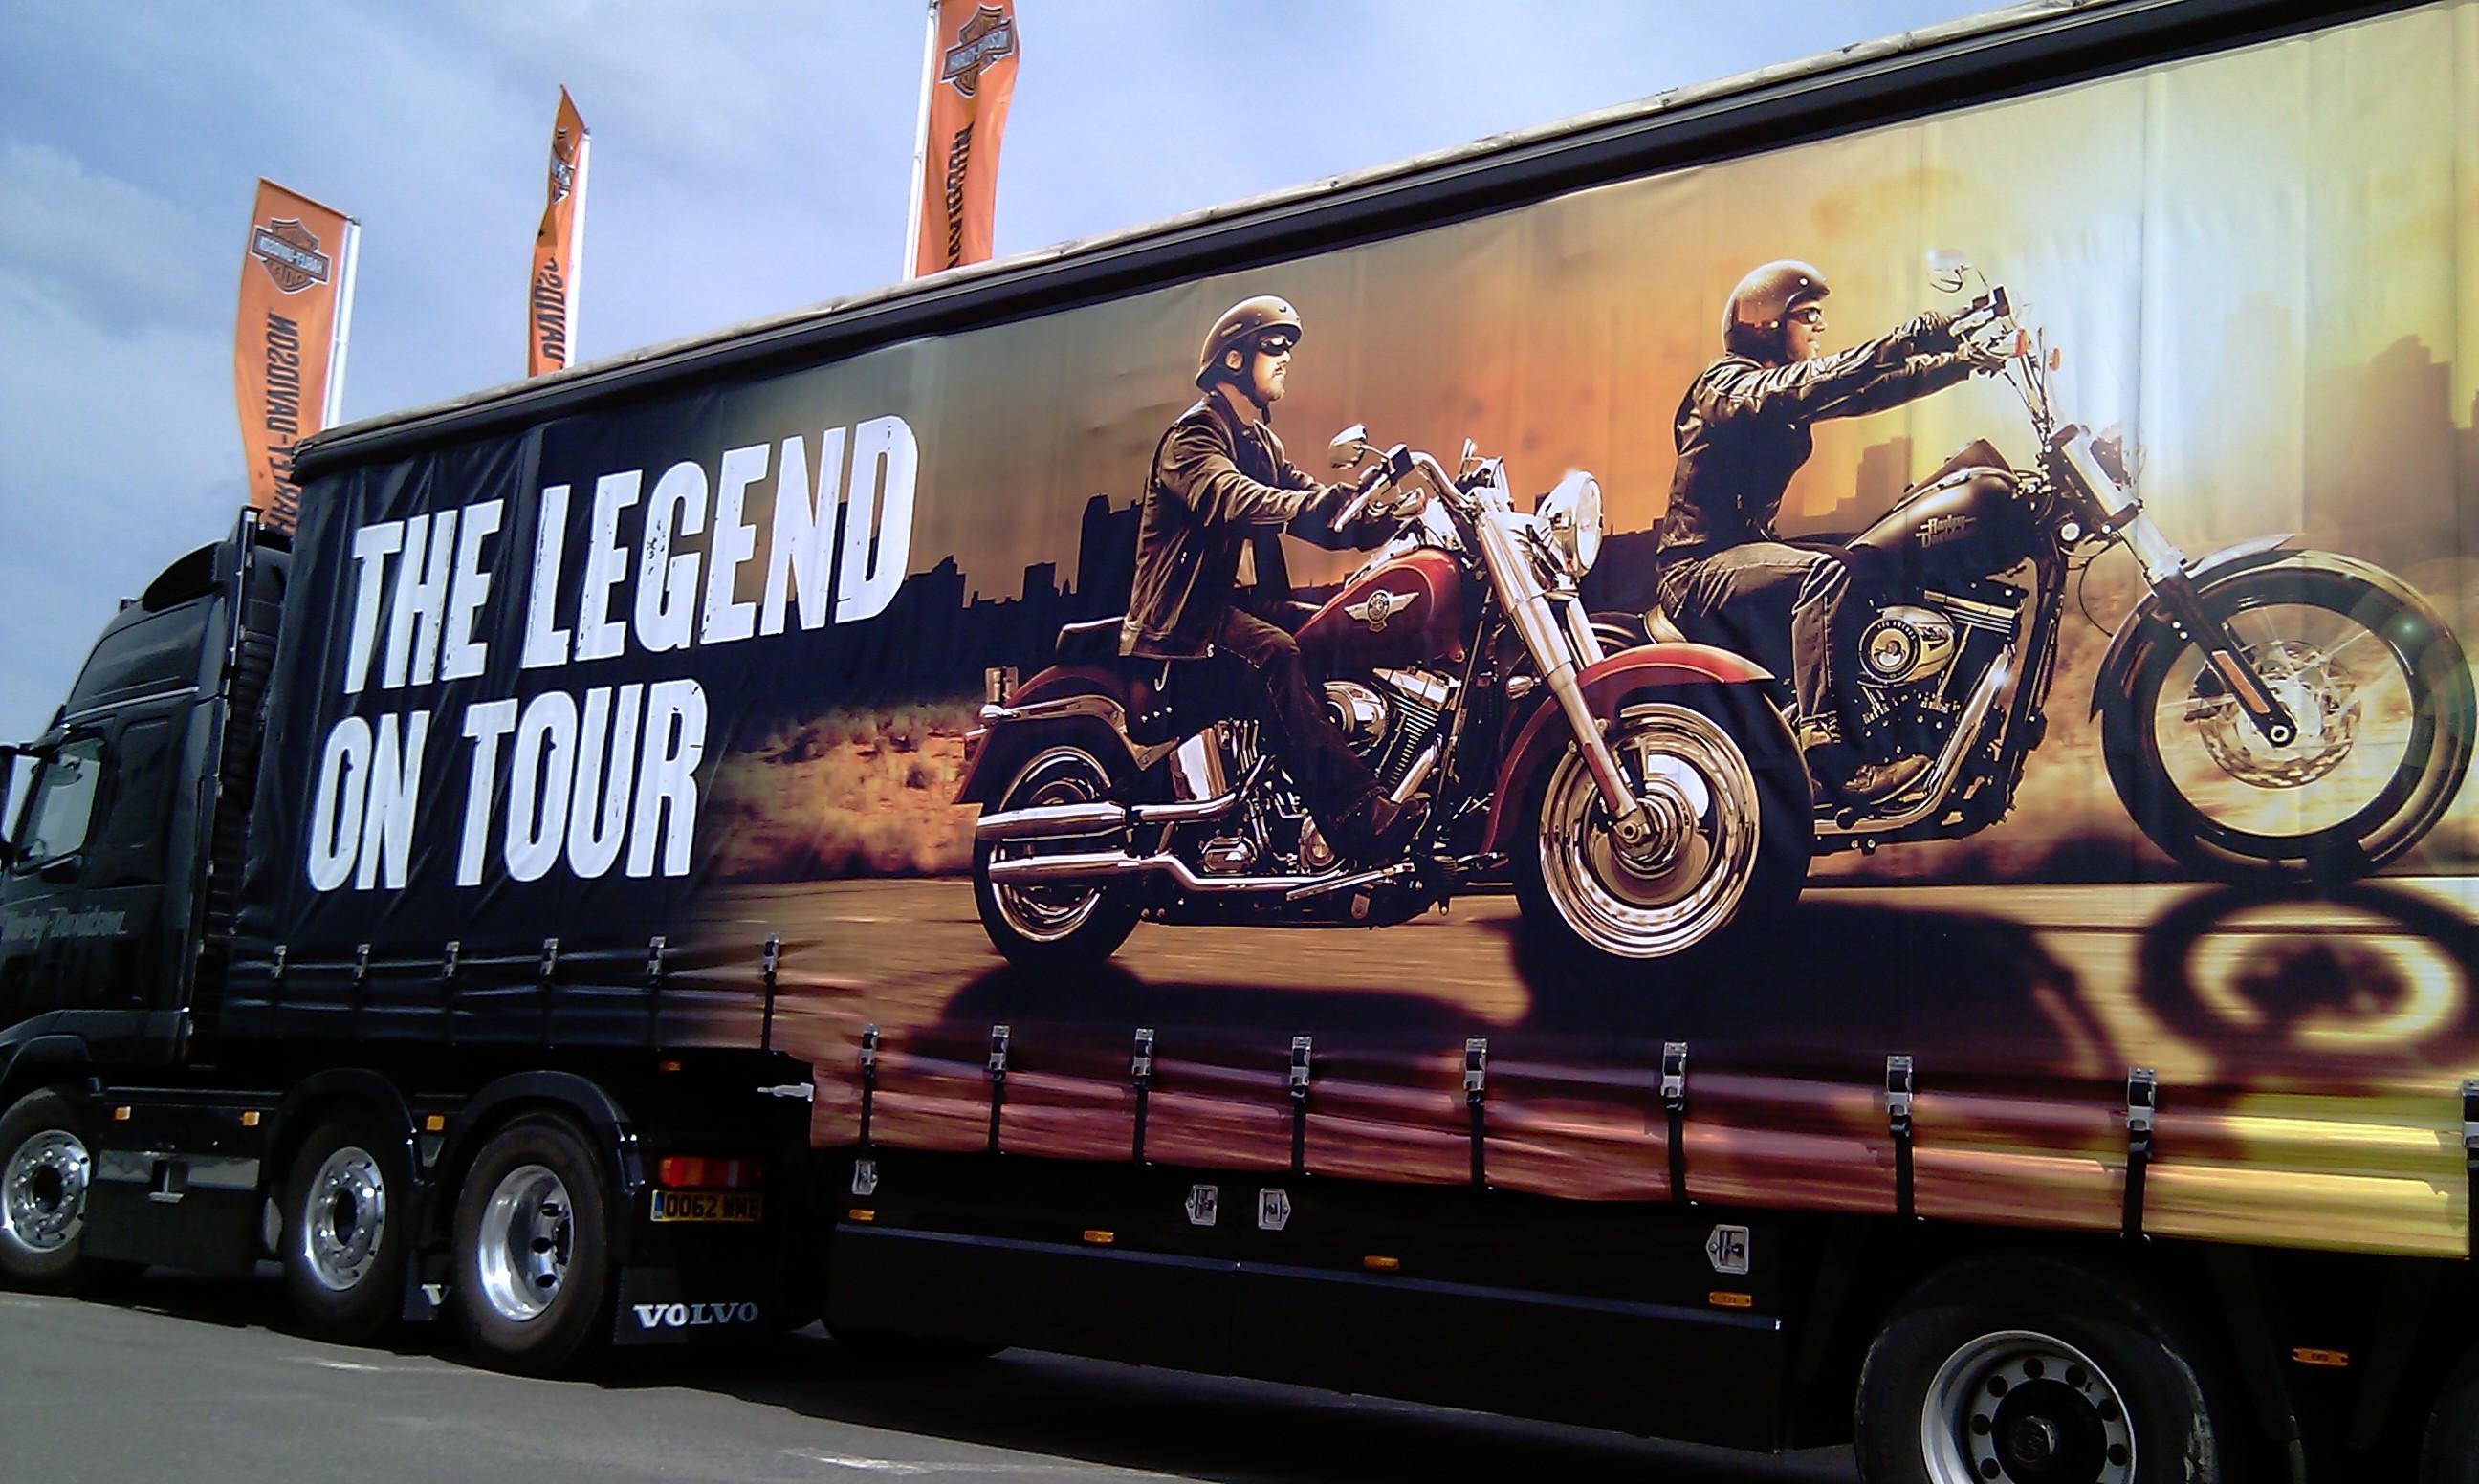 400 de motociclisti au testat modelele Harley-Davidson weekendul trecut